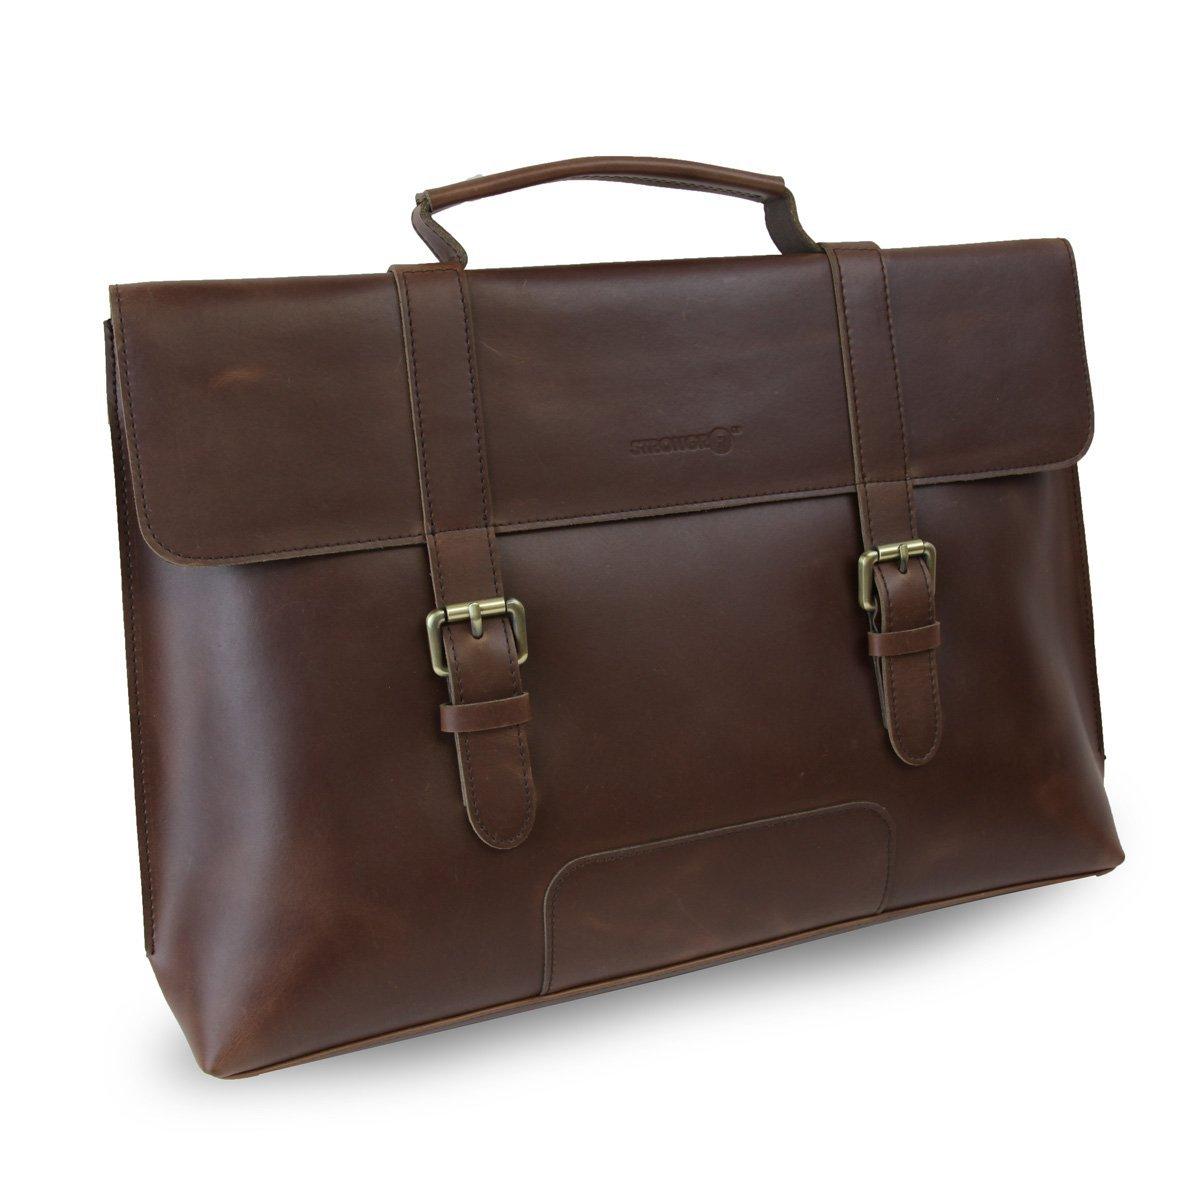 Strongrr Single Piece Brown Professor Briefcase, Vinyl 17-inch Laptop Attach Briefcase, Locking, Business, Laptop, Solid Pattern, Phone Compartment, laptop briefcase 17